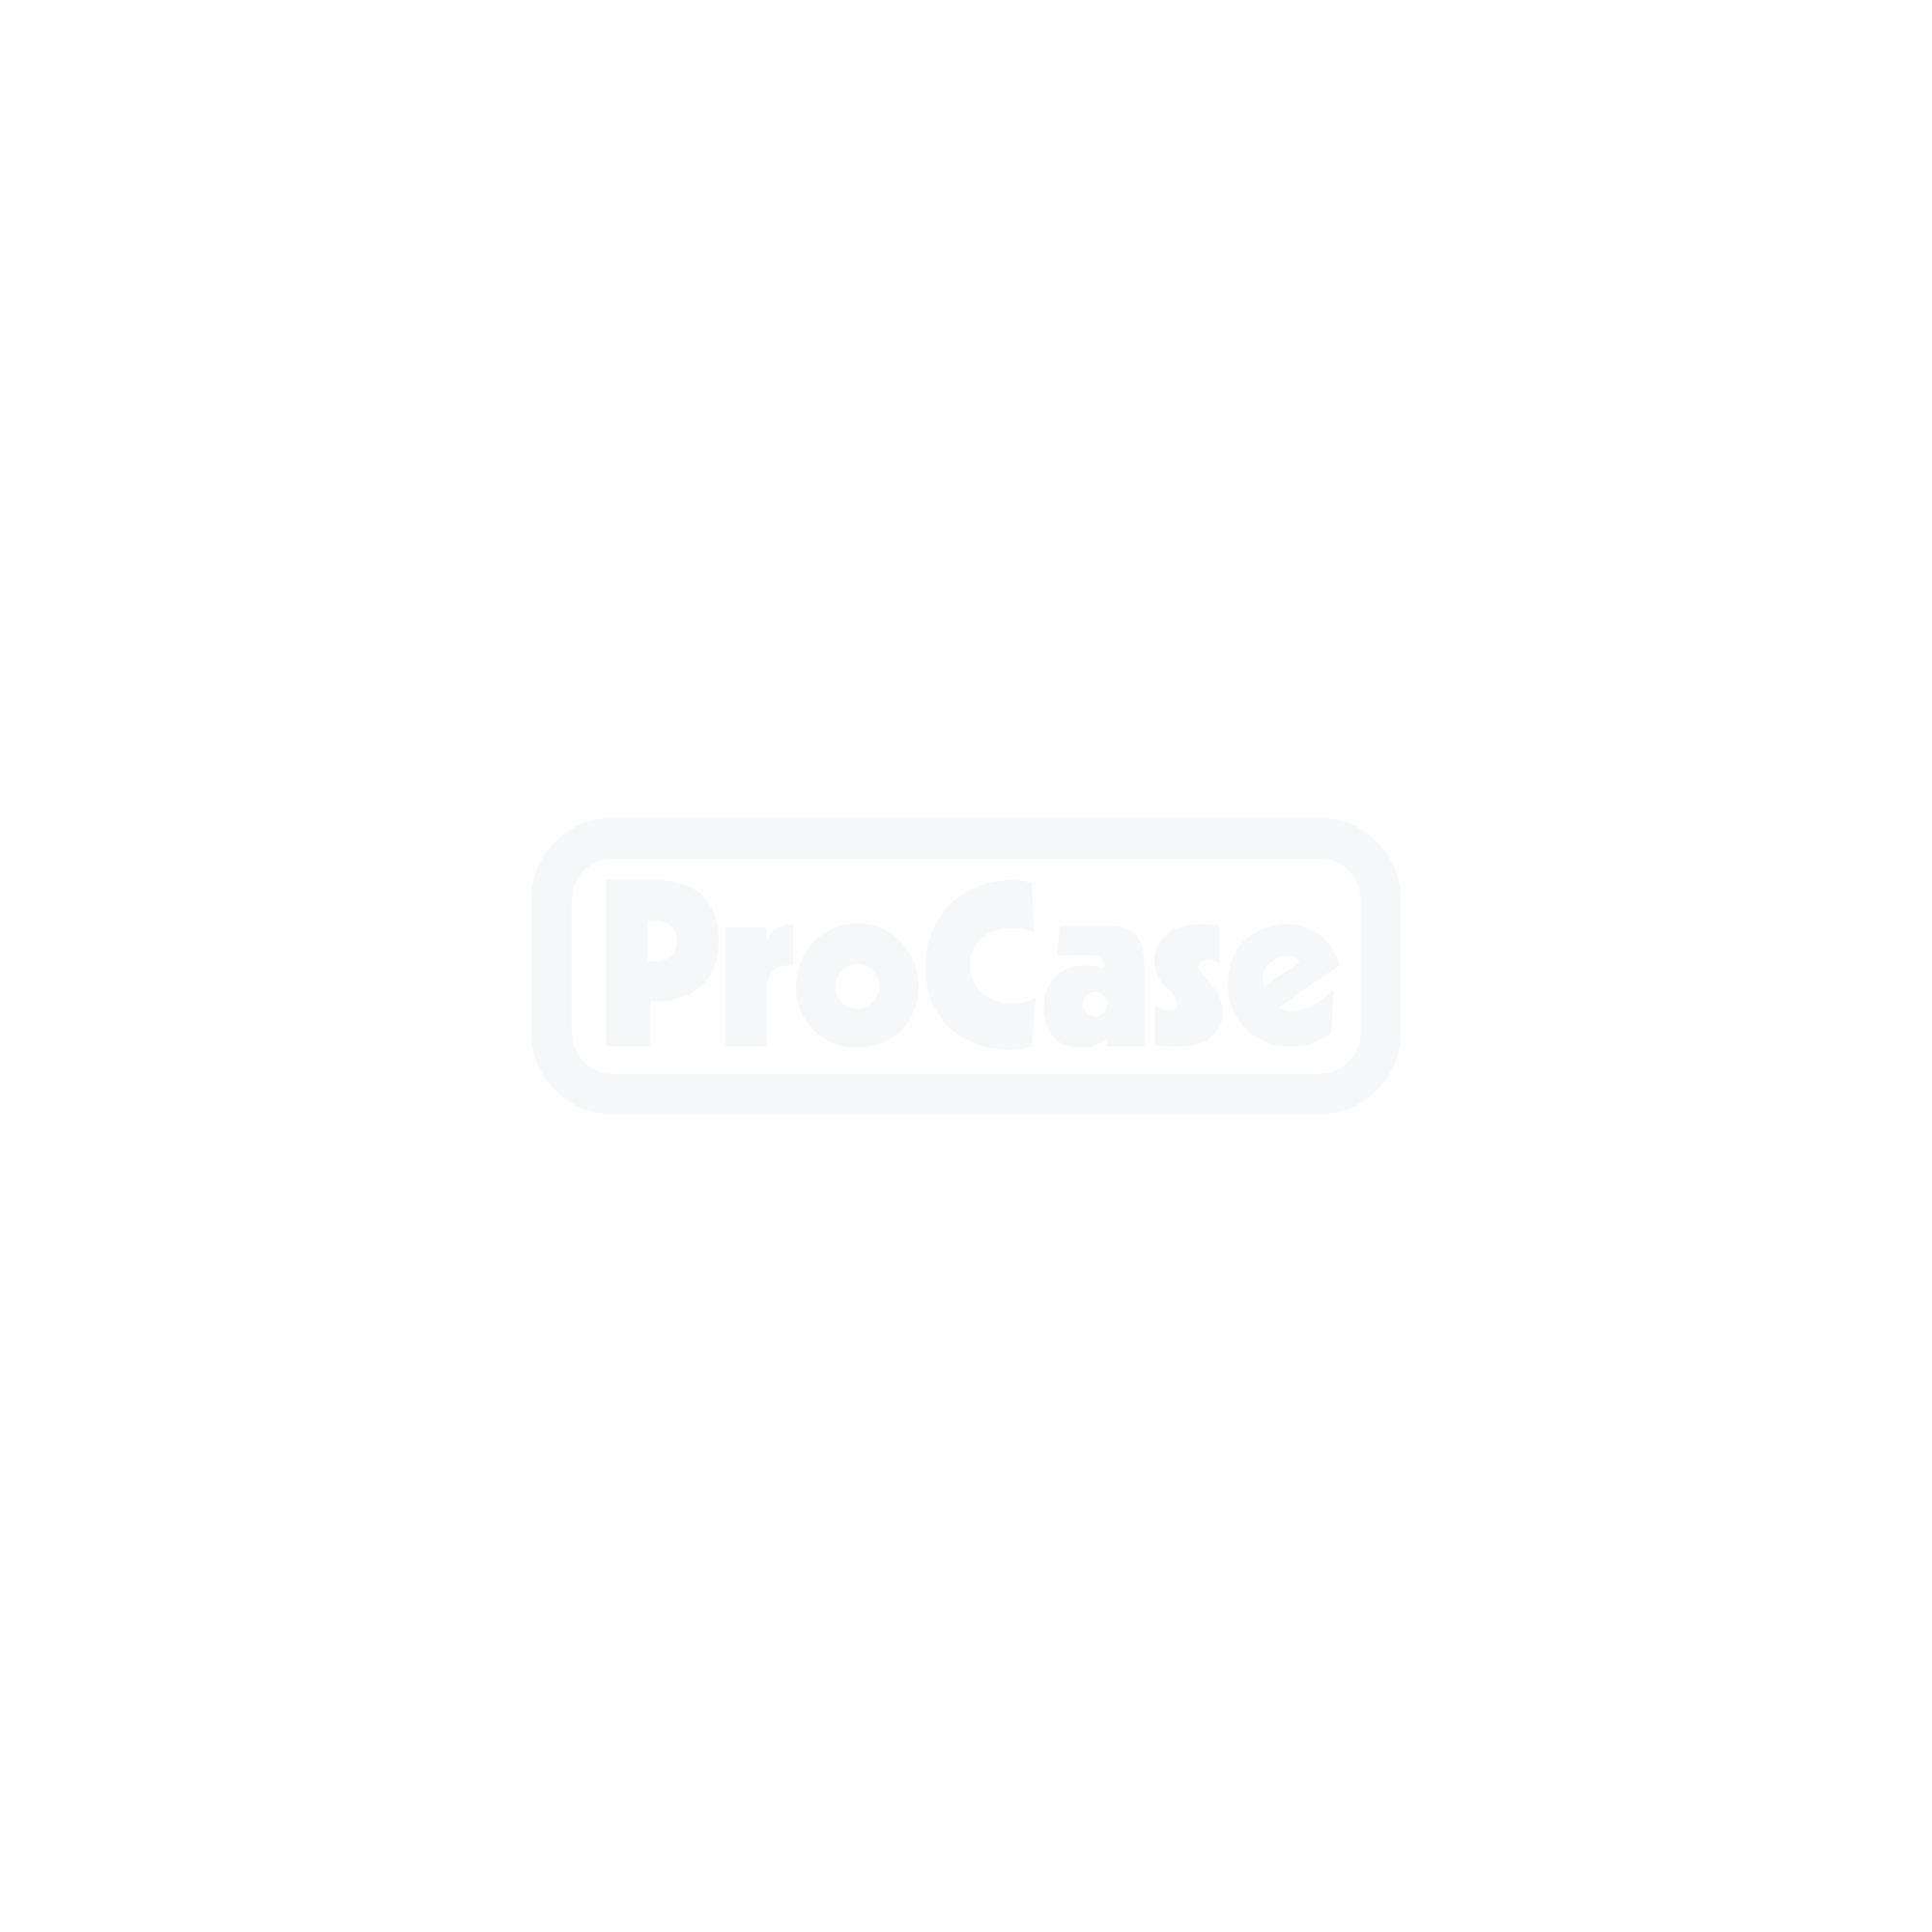 Uni Trägerplattencase 2